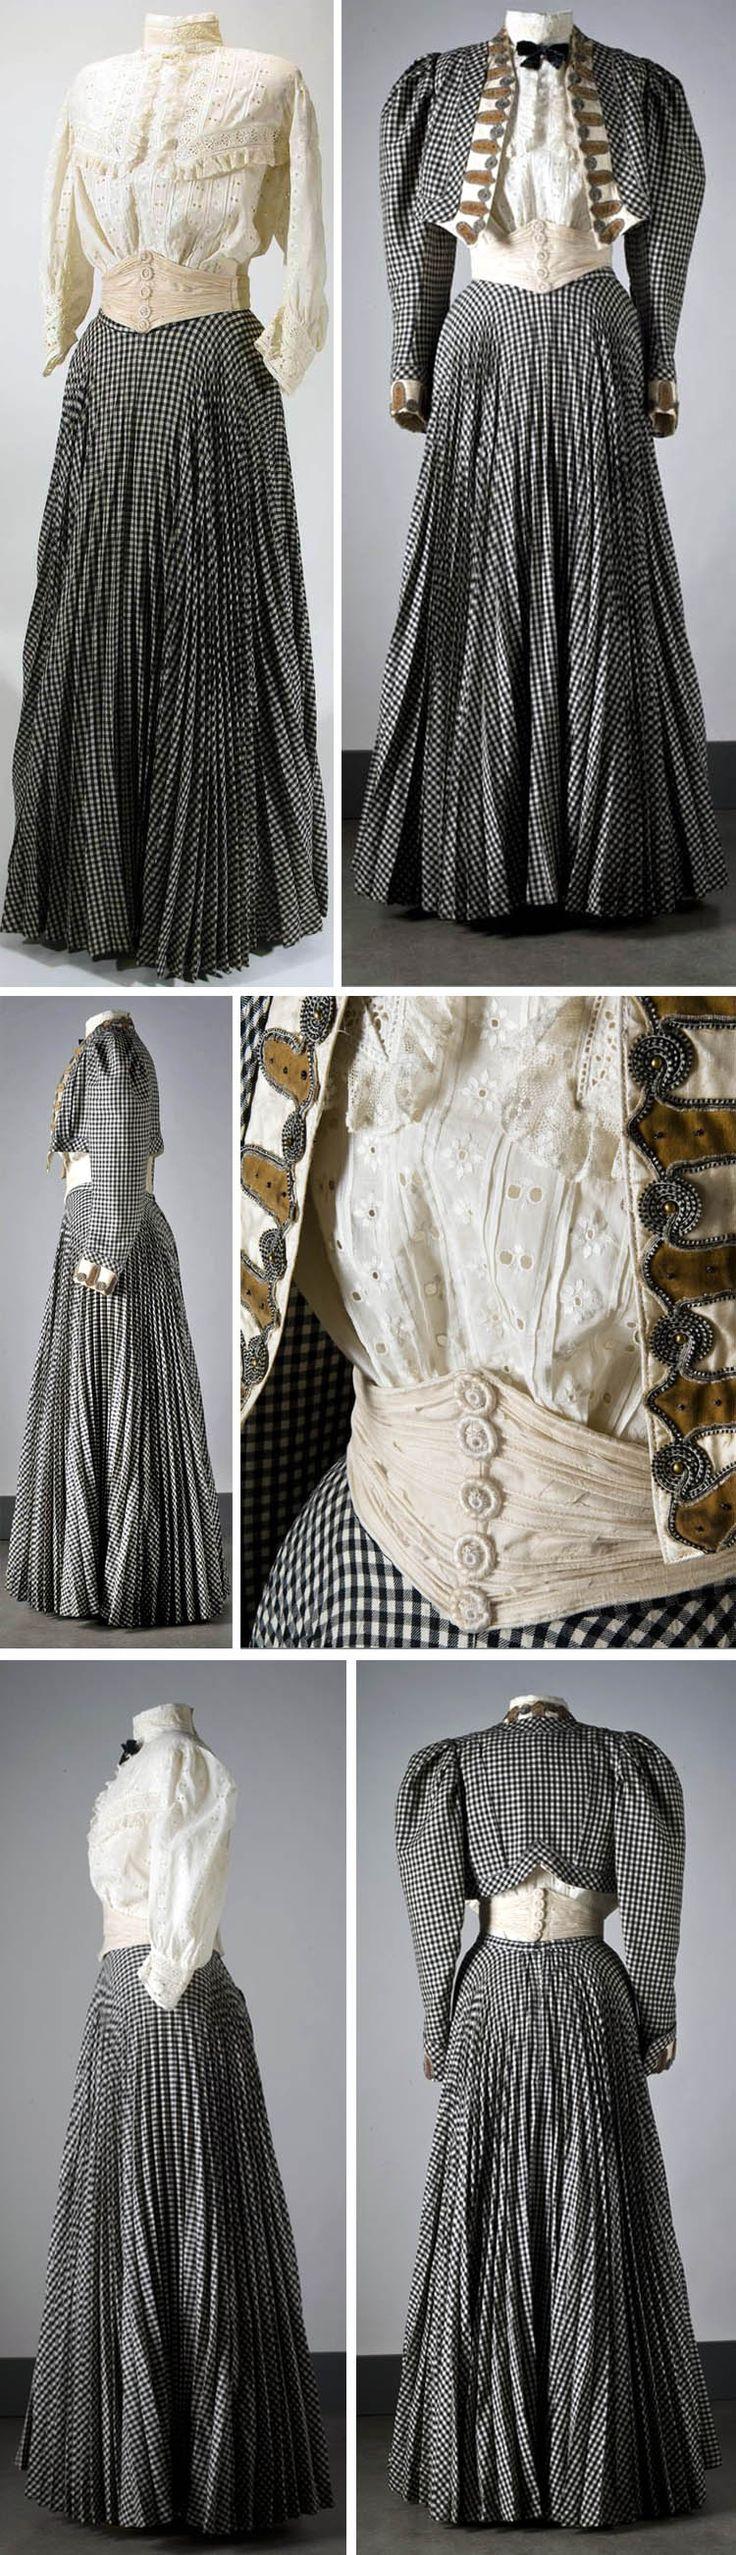 Walking costume, 1906. Jacket, skirt, blouse, cummerbund. Wool and cotton. Photos: Mats Landin. Nordic Museum, Sweden